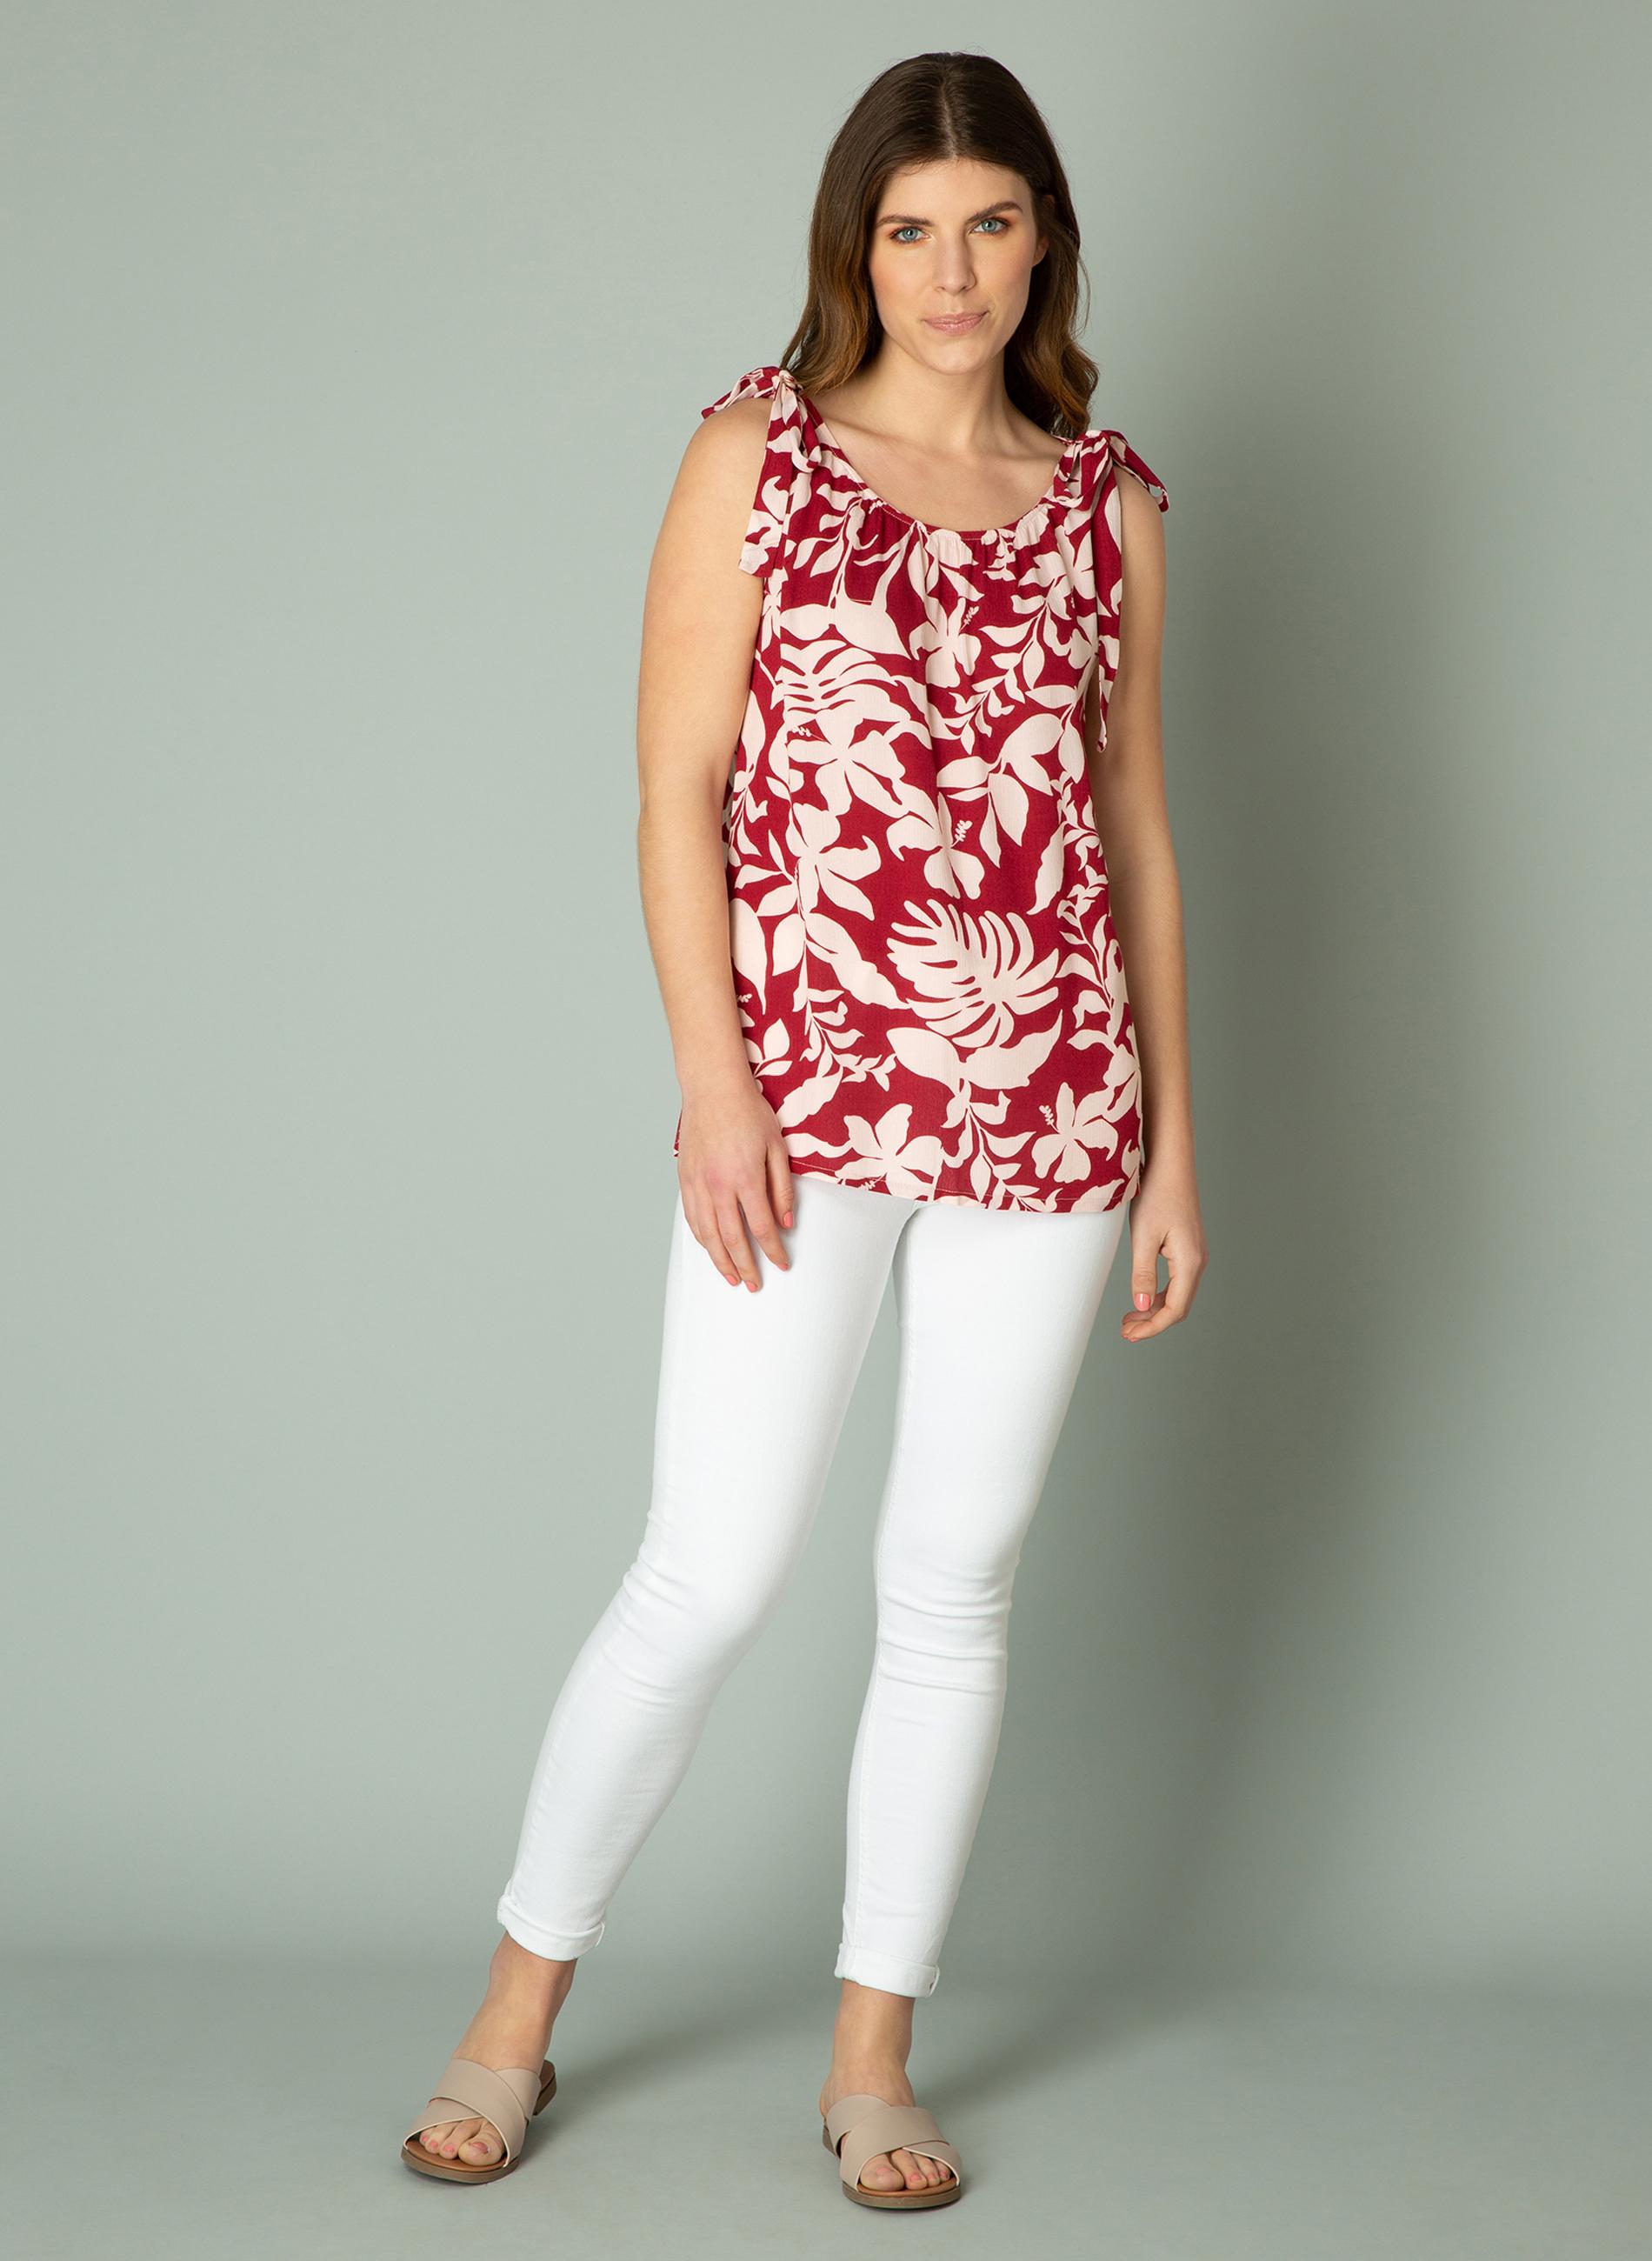 Yest shirt Ivanka 70 cm